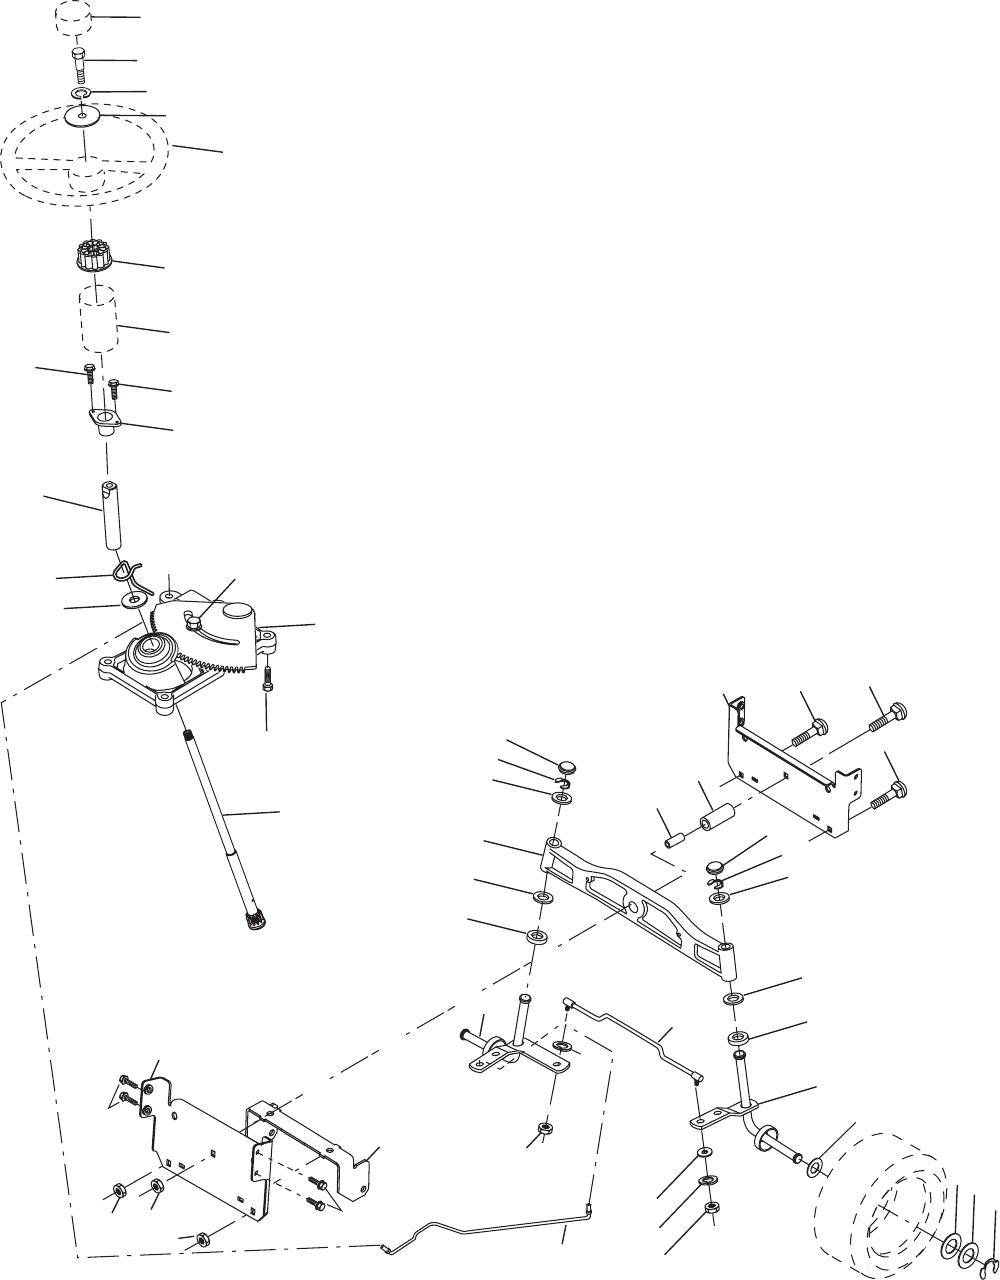 Husqvarna Lth1797 Users Manual OM, LTH1797, 96011022101